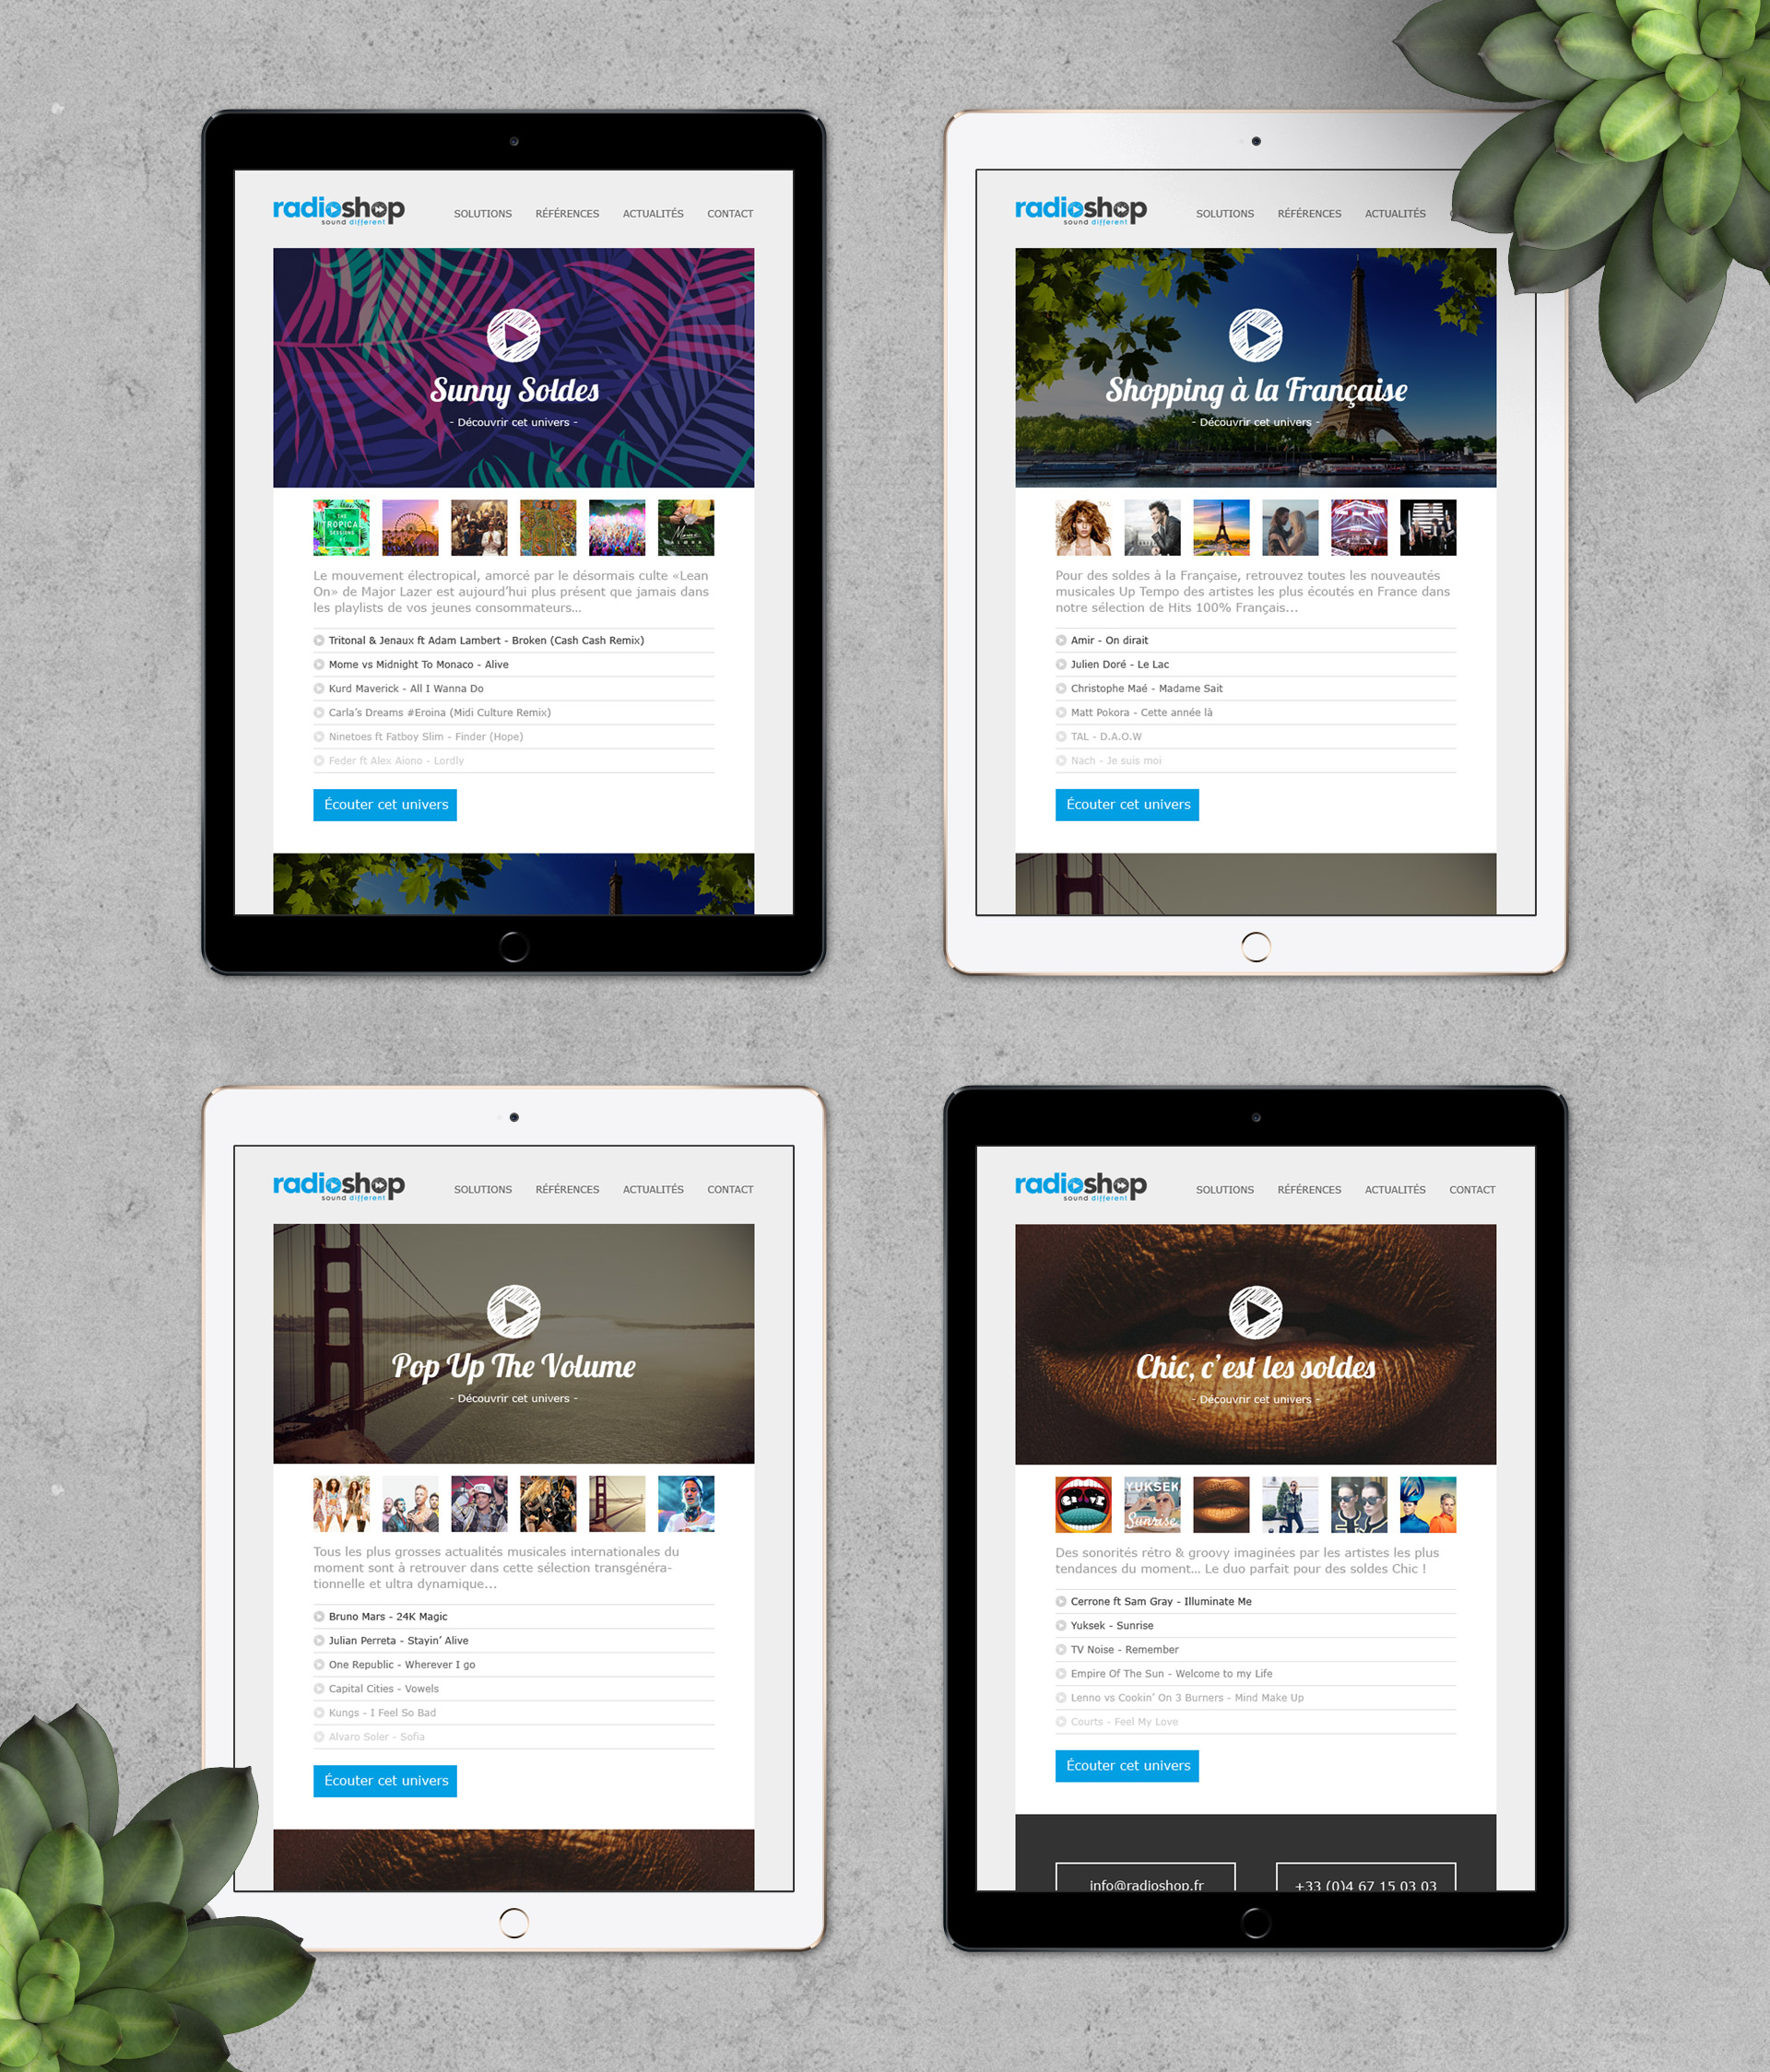 radioshop-creation-newsletter-e-mailing-responsive-design-graphiste-montpellier